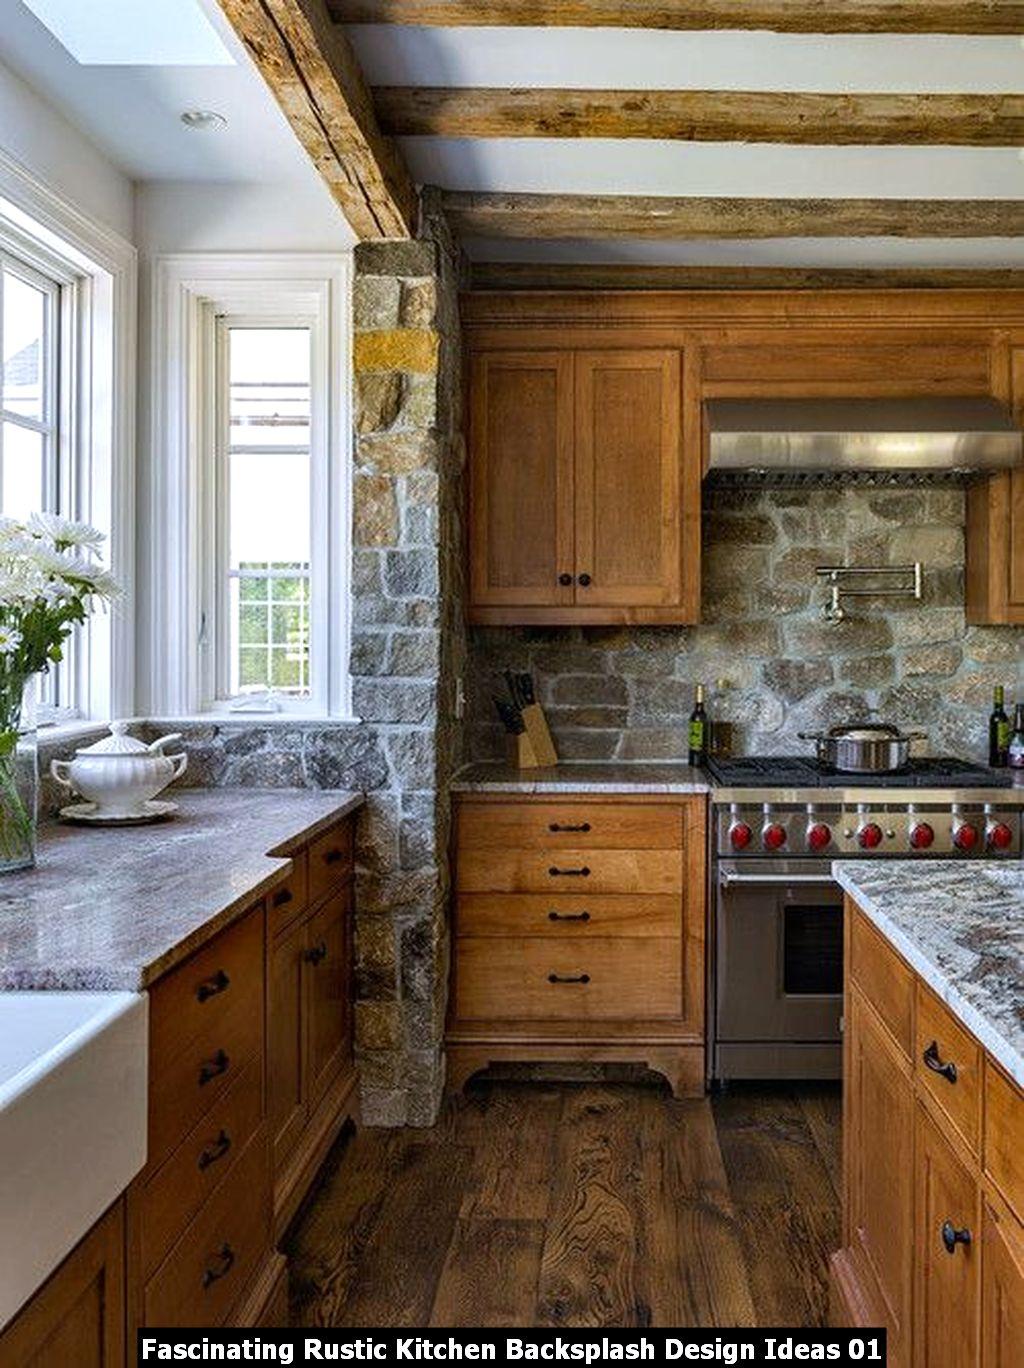 Fascinating Rustic Kitchen Backsplash Design Ideas 01